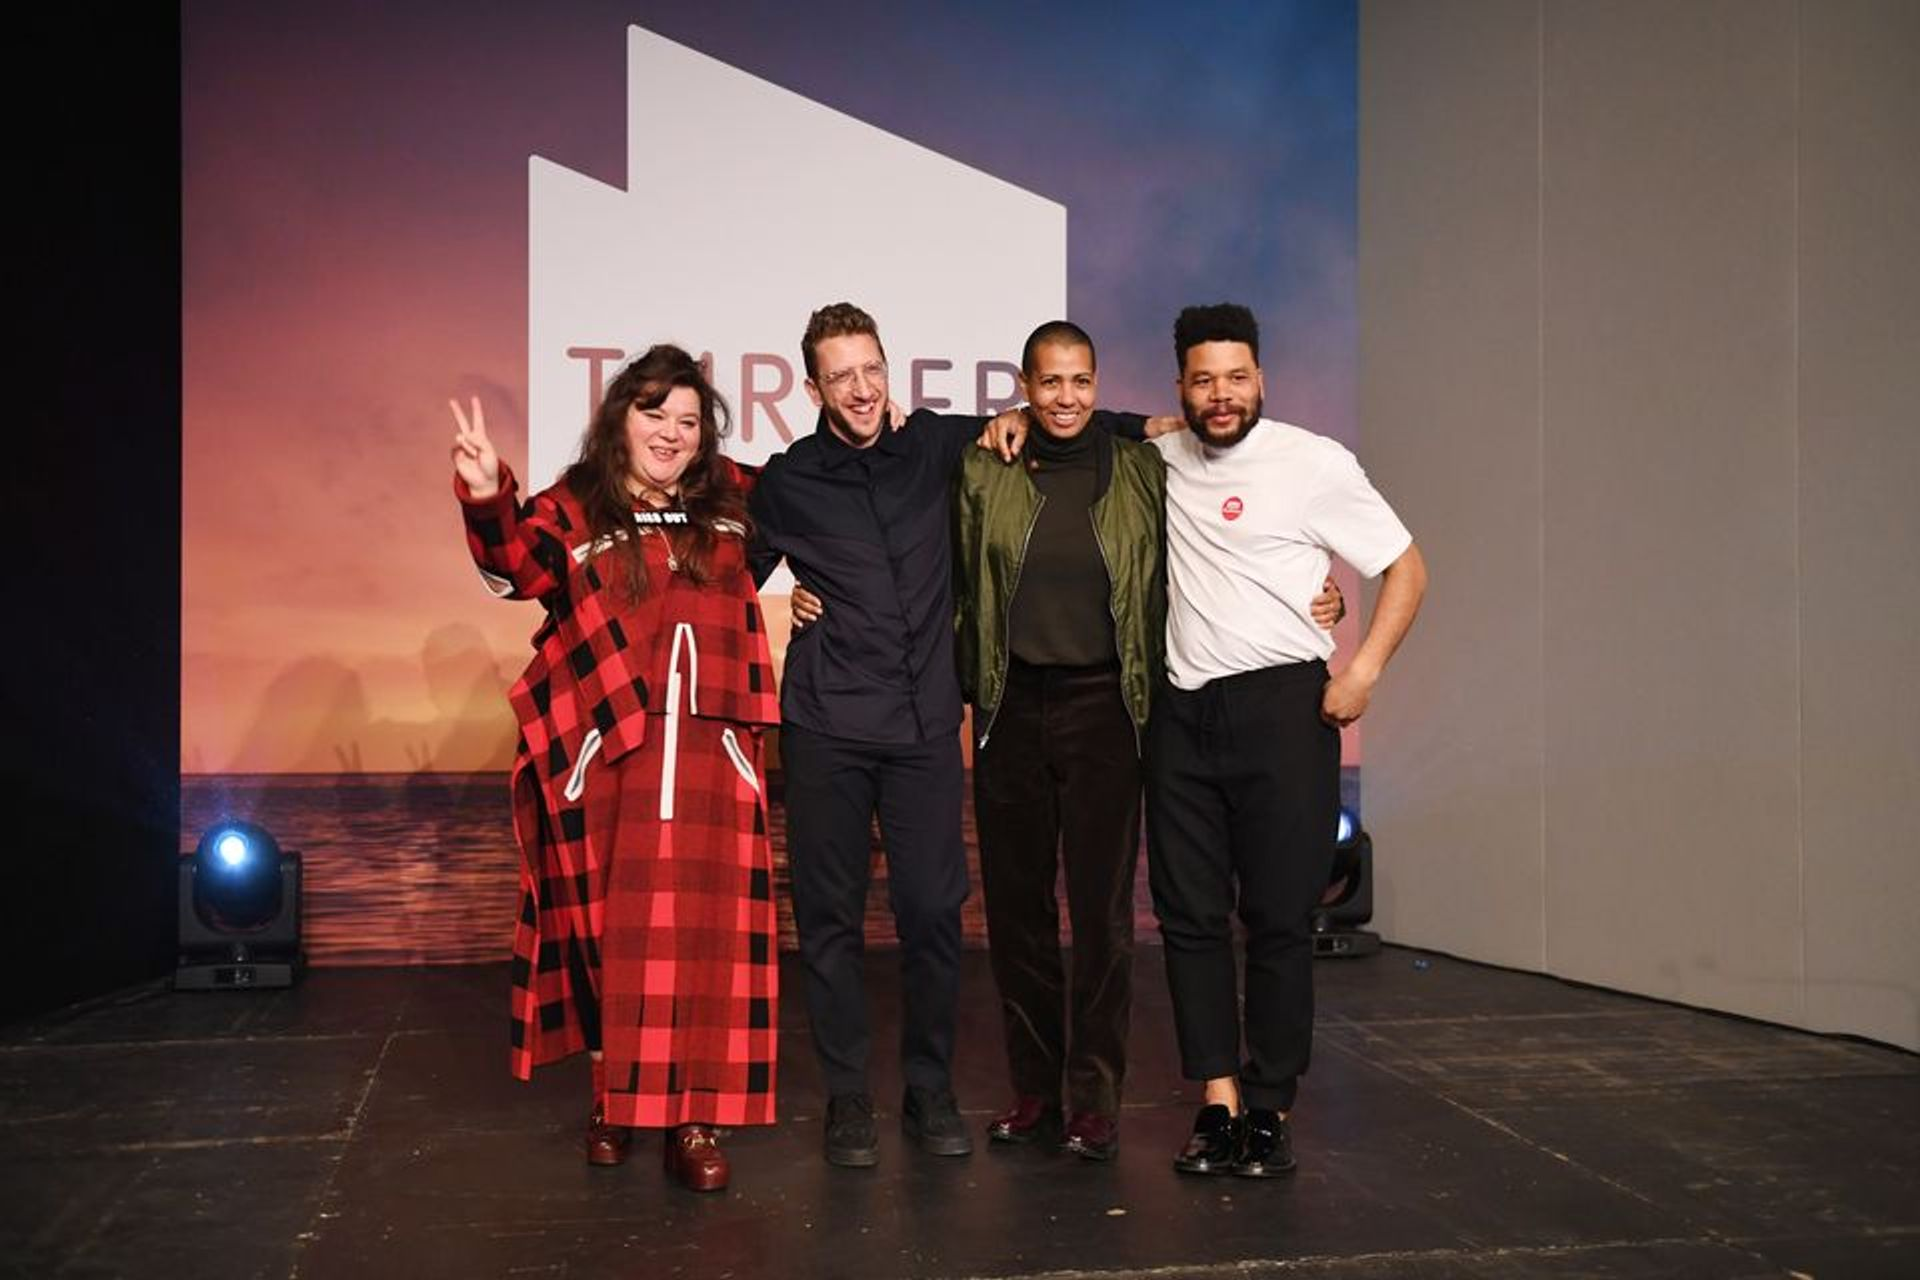 Tai Shani, Lawrence Abu Hamdan, Helen Cammock and Oscar Murillo's shared the Turner Prize in 2019 Photo: © Stuart Wilson/Getty Images